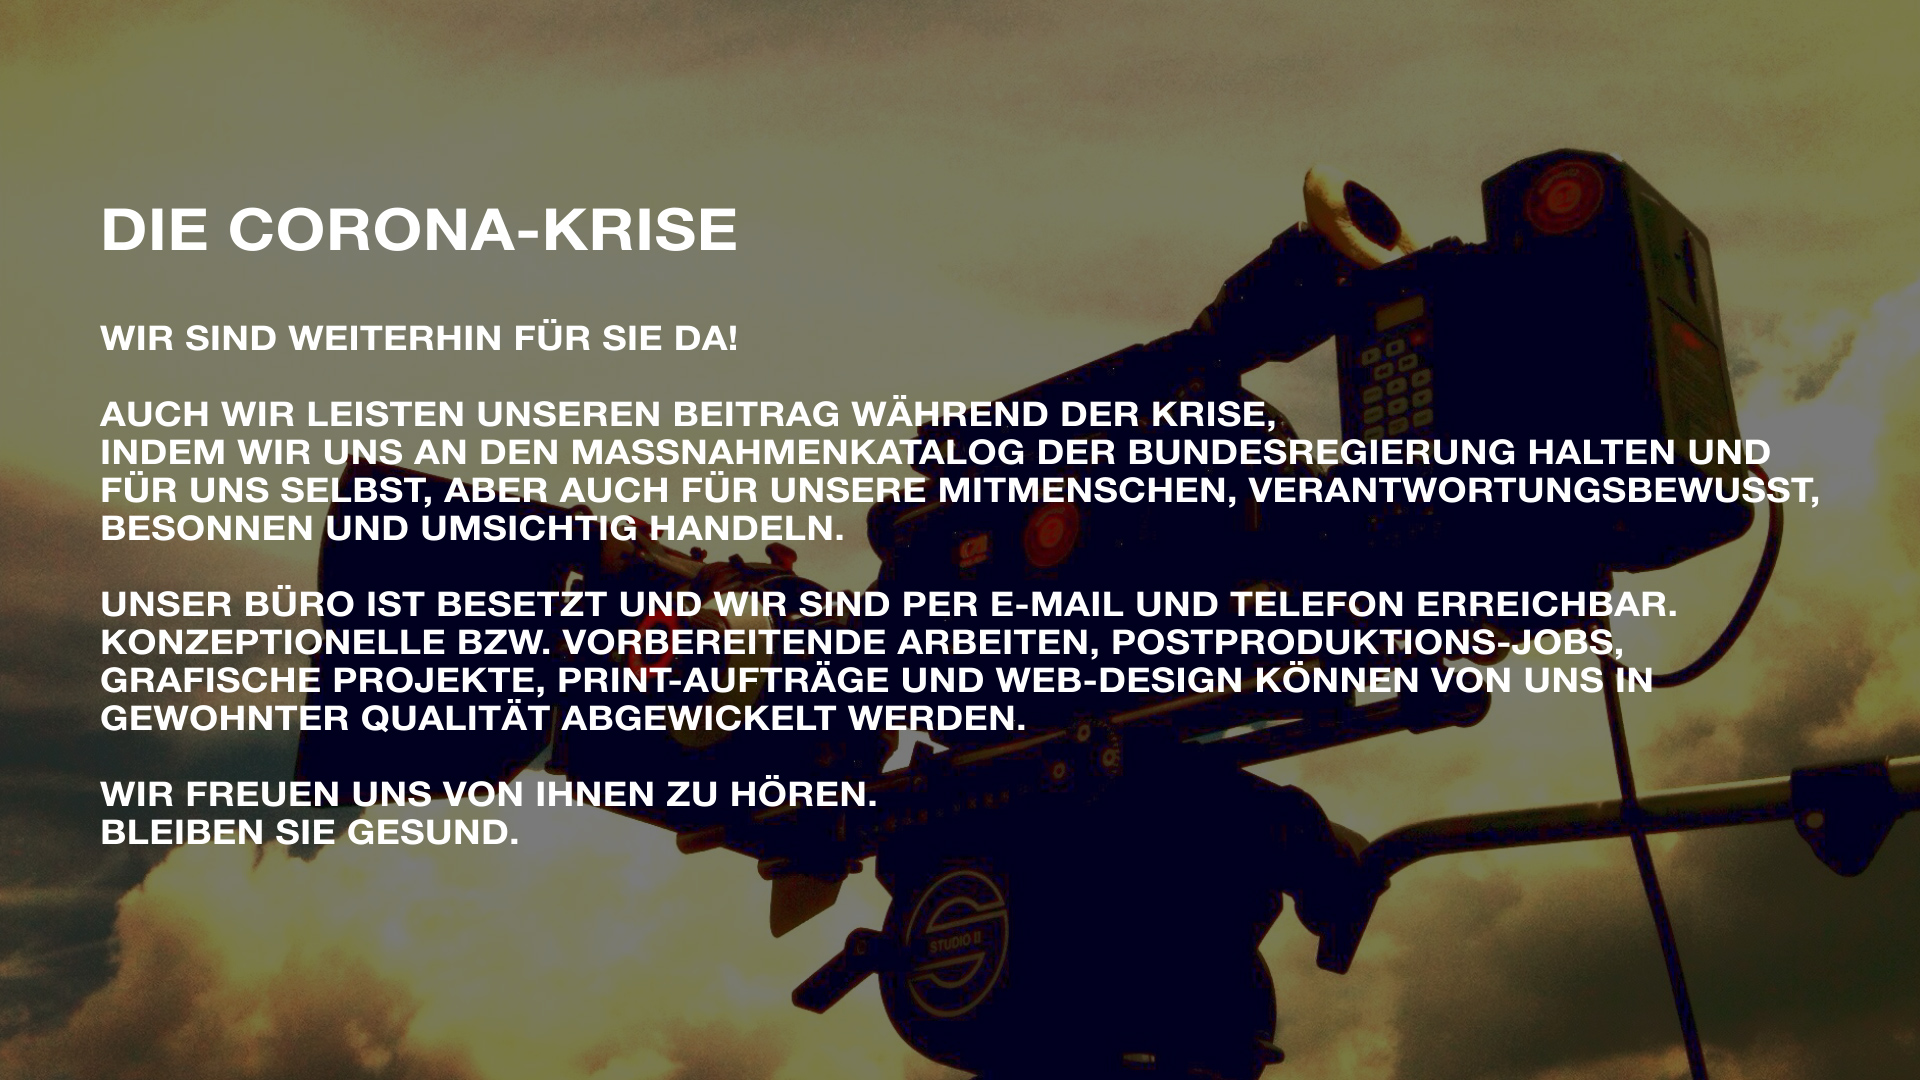 Corona Krise Poster. 3jpg - Strickroth & Fiege Fotografie